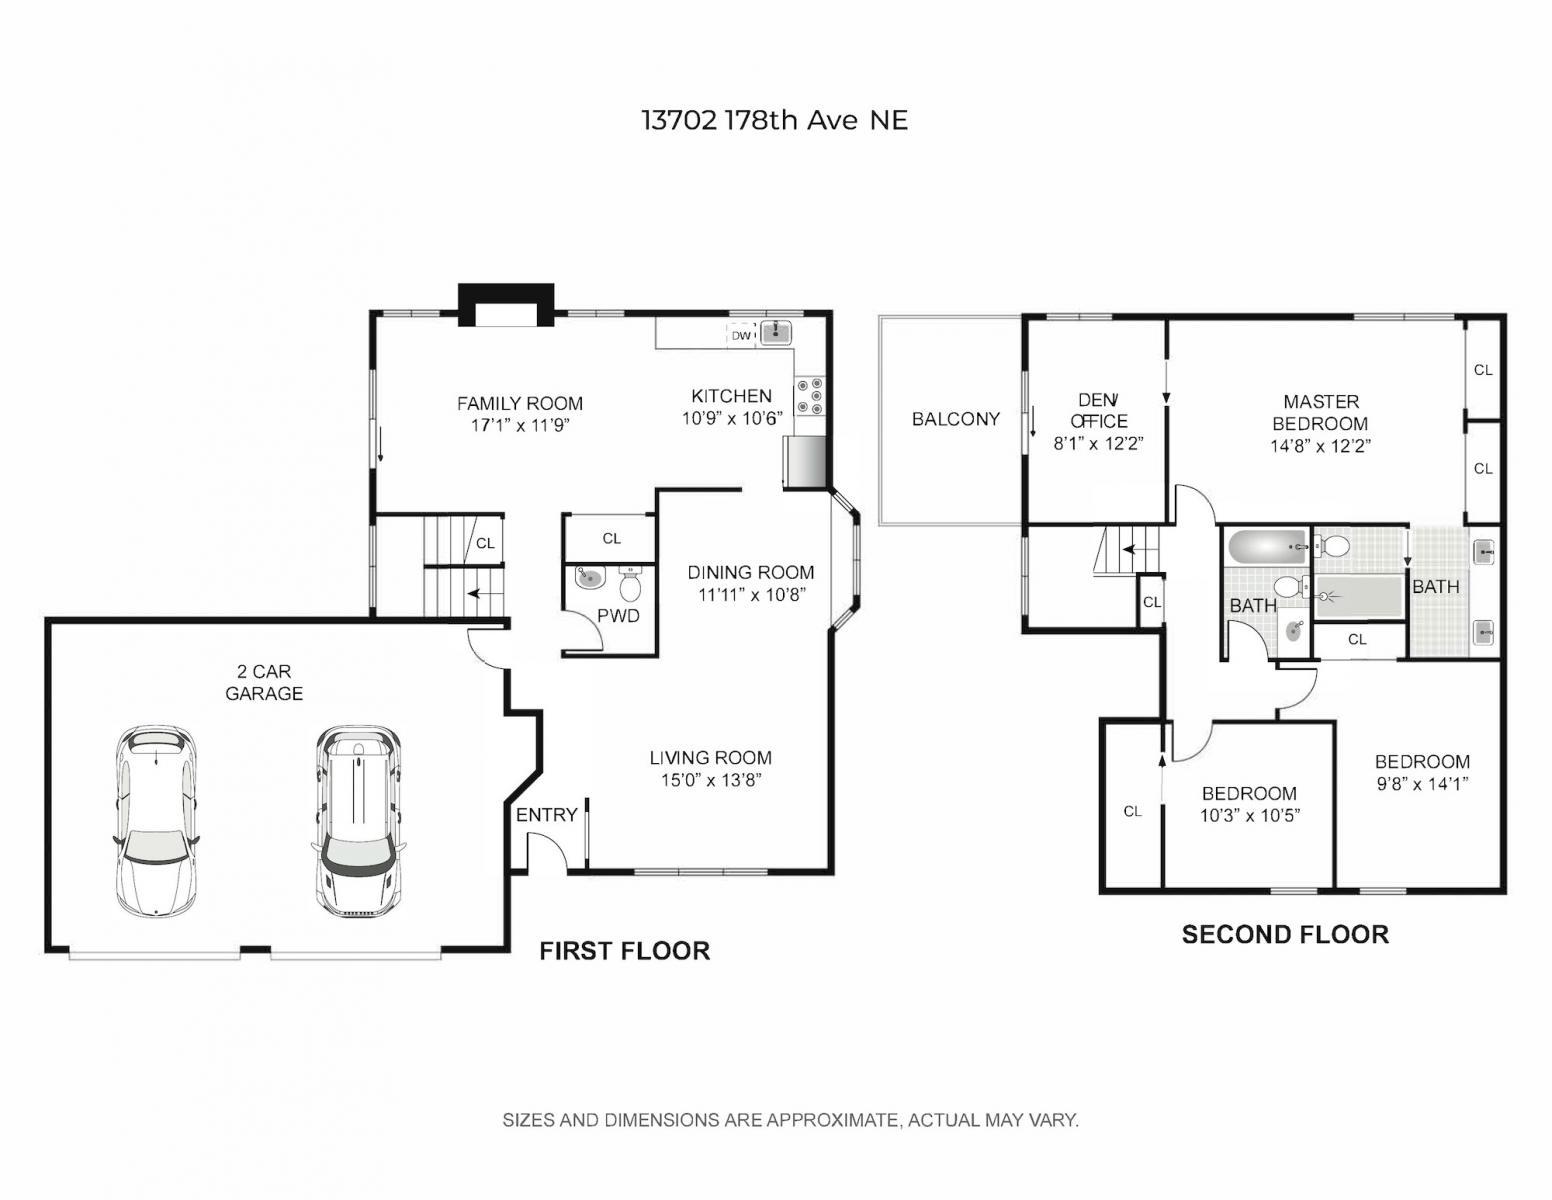 13702-178th-Avenue-NE-Floorplan